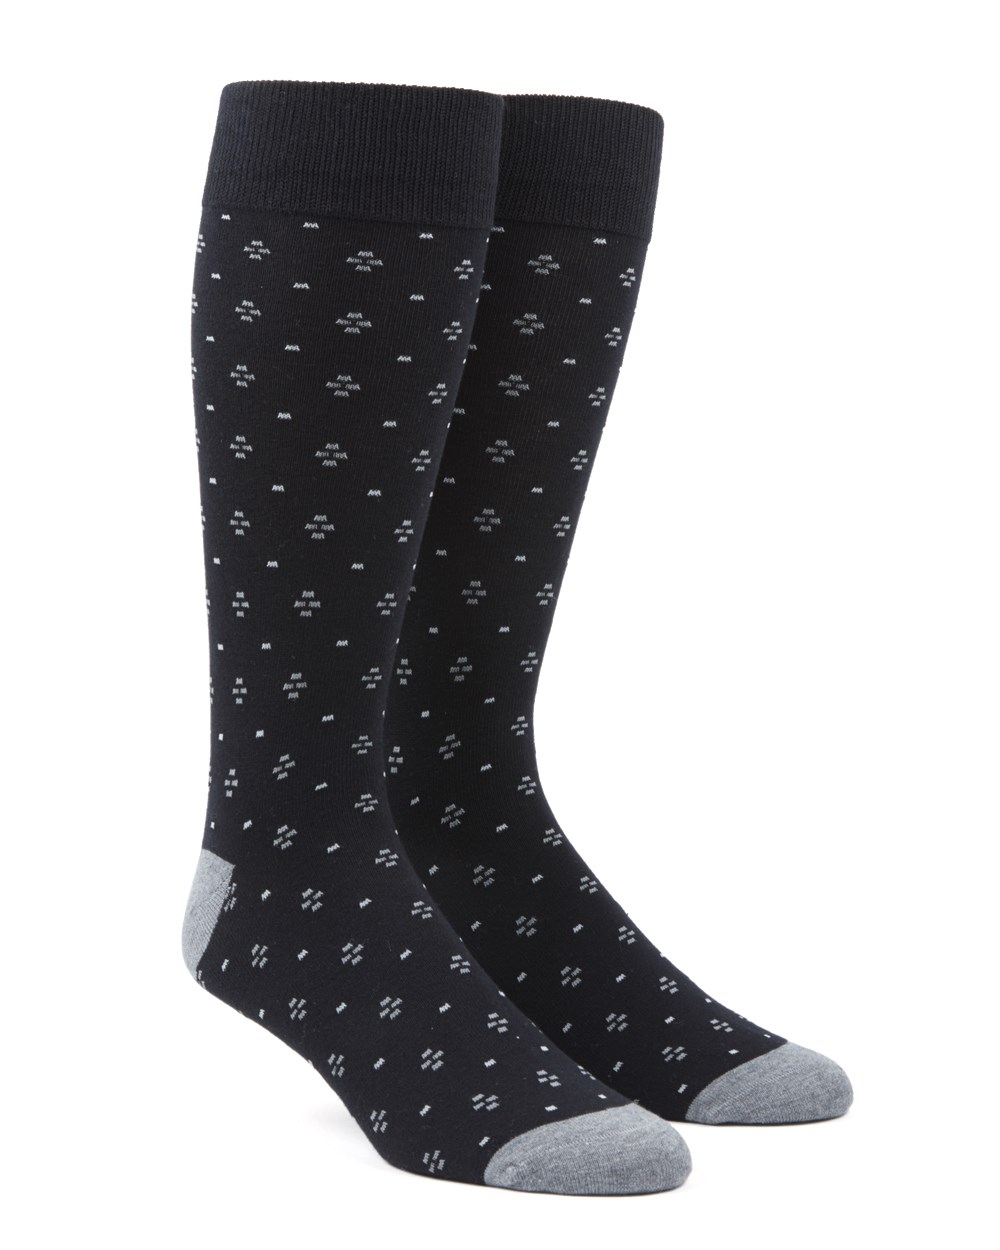 Geo Key Black Dress Socks Men S Dress Socks In 2021 Black Dress Socks Mens Dress Socks Dress Socks [ 1250 x 1000 Pixel ]